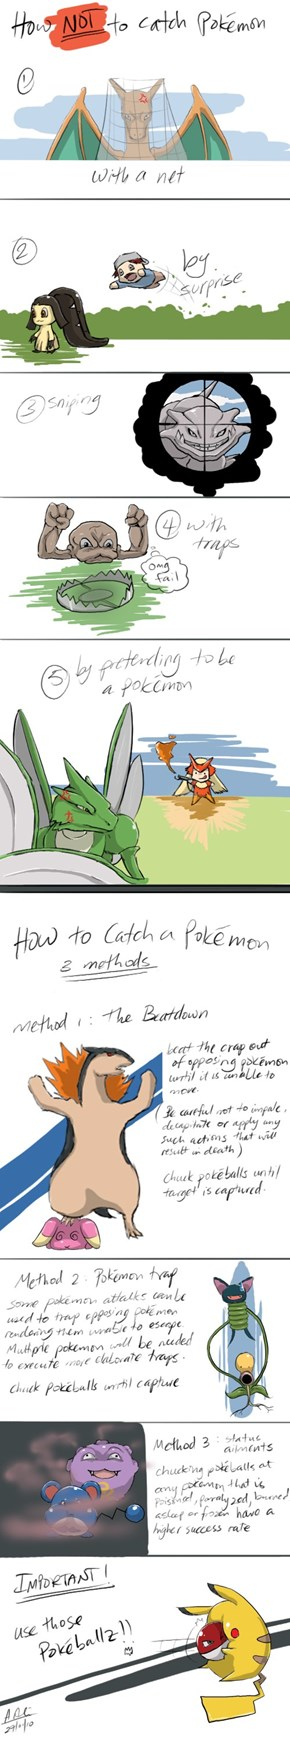 Pokémon Catching 101